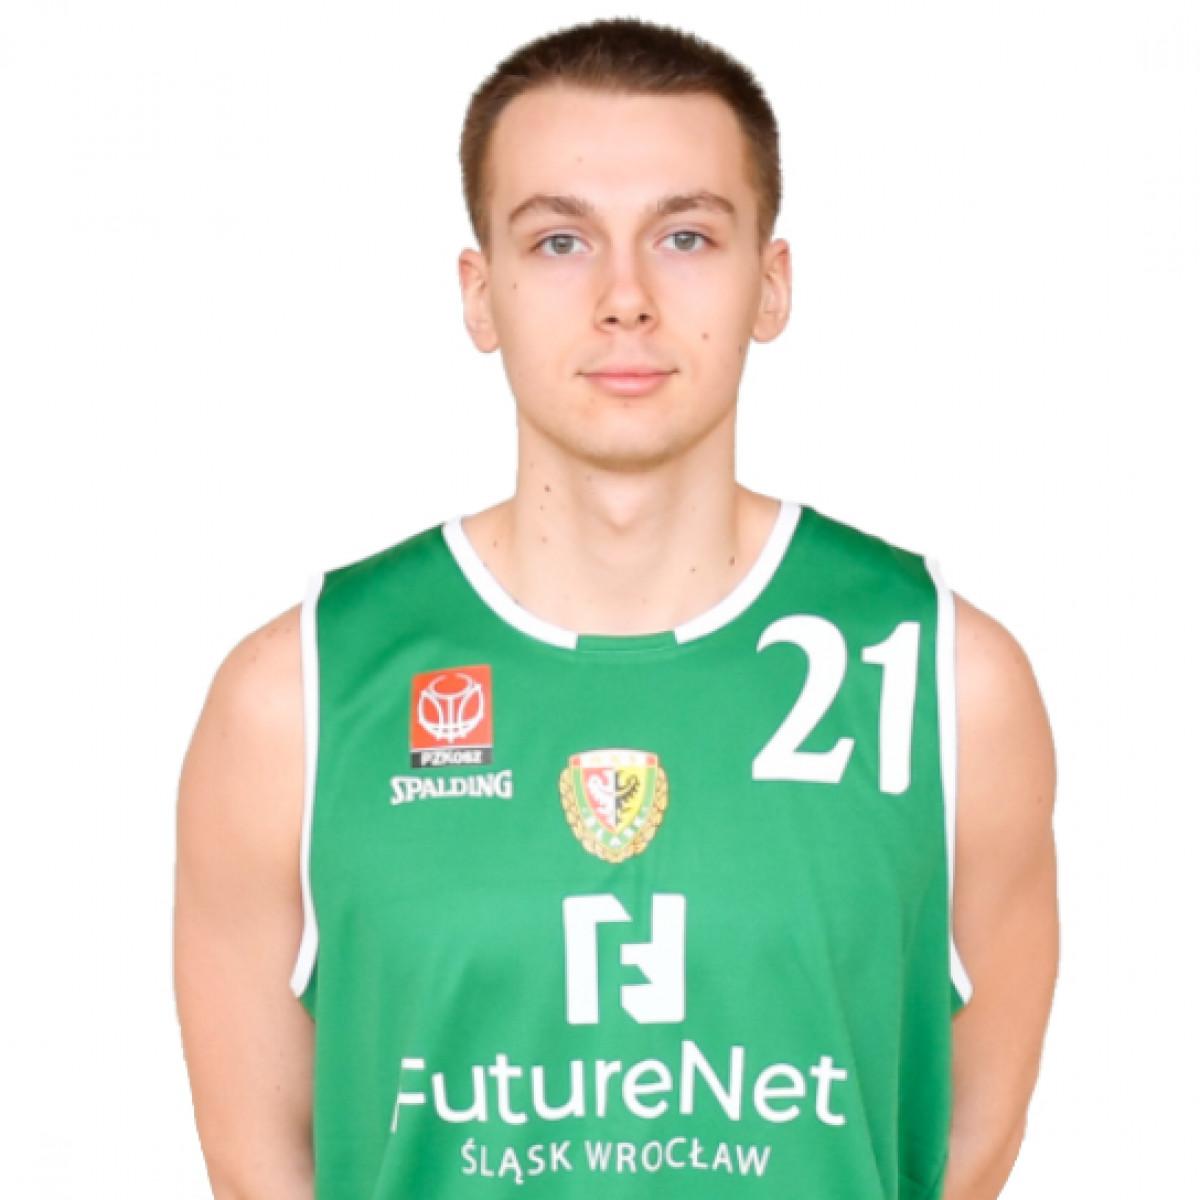 Photo of Maksymilian Zagorski, 2018-2019 season